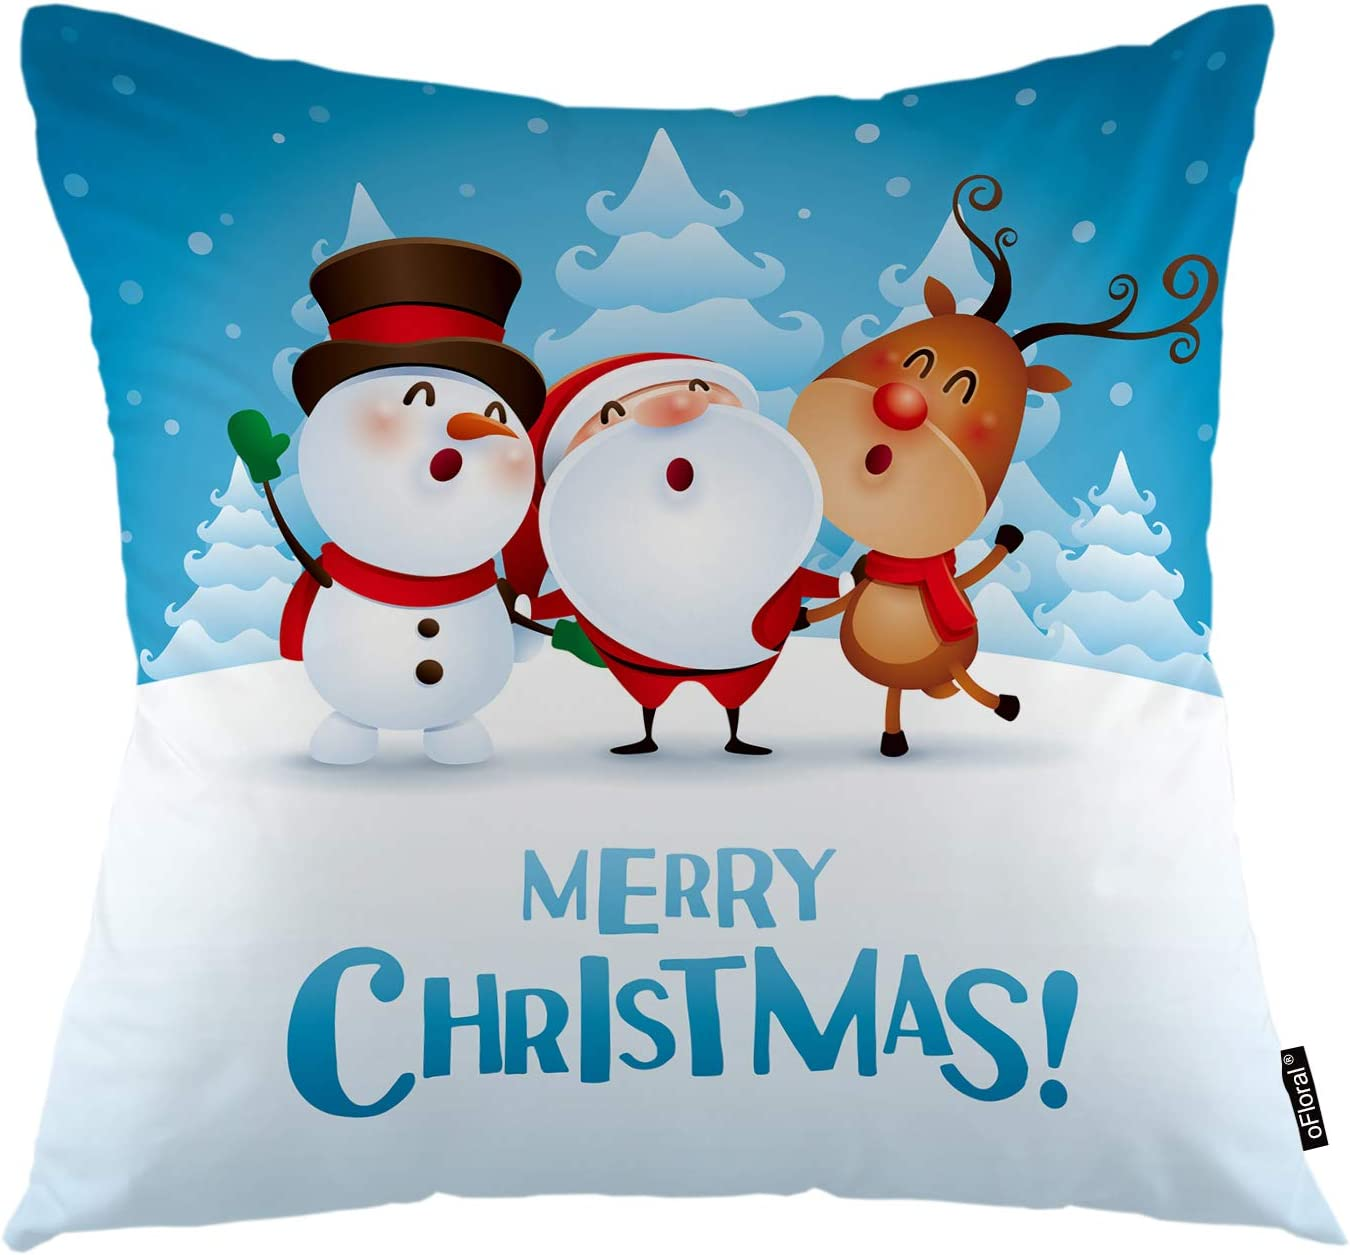 oFloral Christmas Throw Pillow Cover Cartoon Santa Snowman Deer Companions Dancing Singing Decorative Pillow Case Home Decor for Sofa Bedroom Car 18x18 Inch Pillowcase